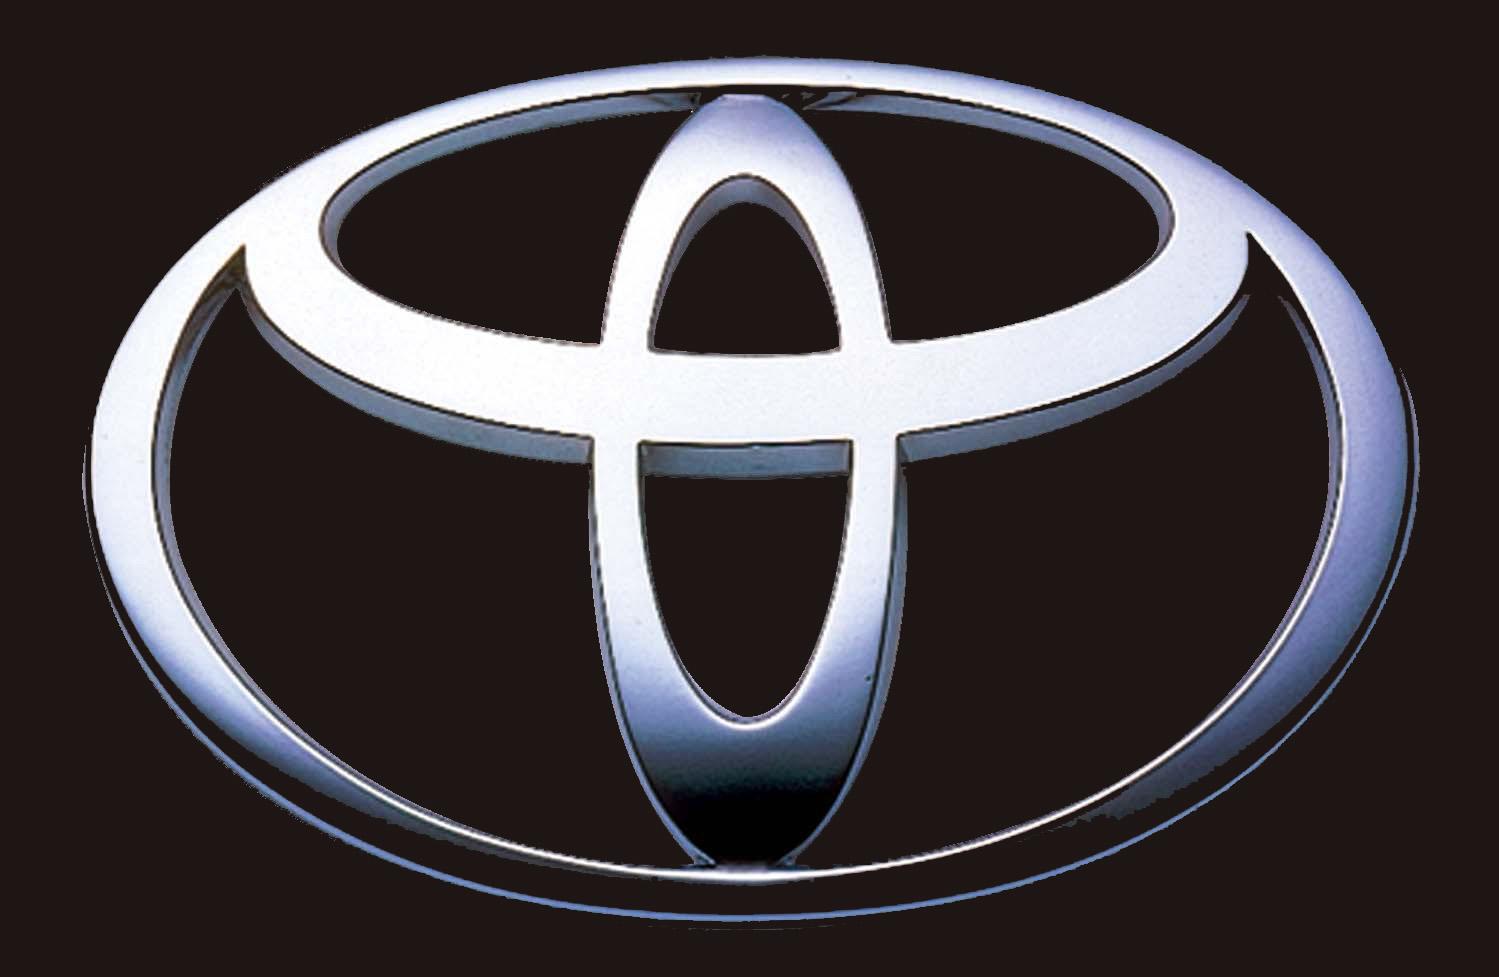 100 Toyota Camry Logo Jdm 1992 1996 Toyota Camry